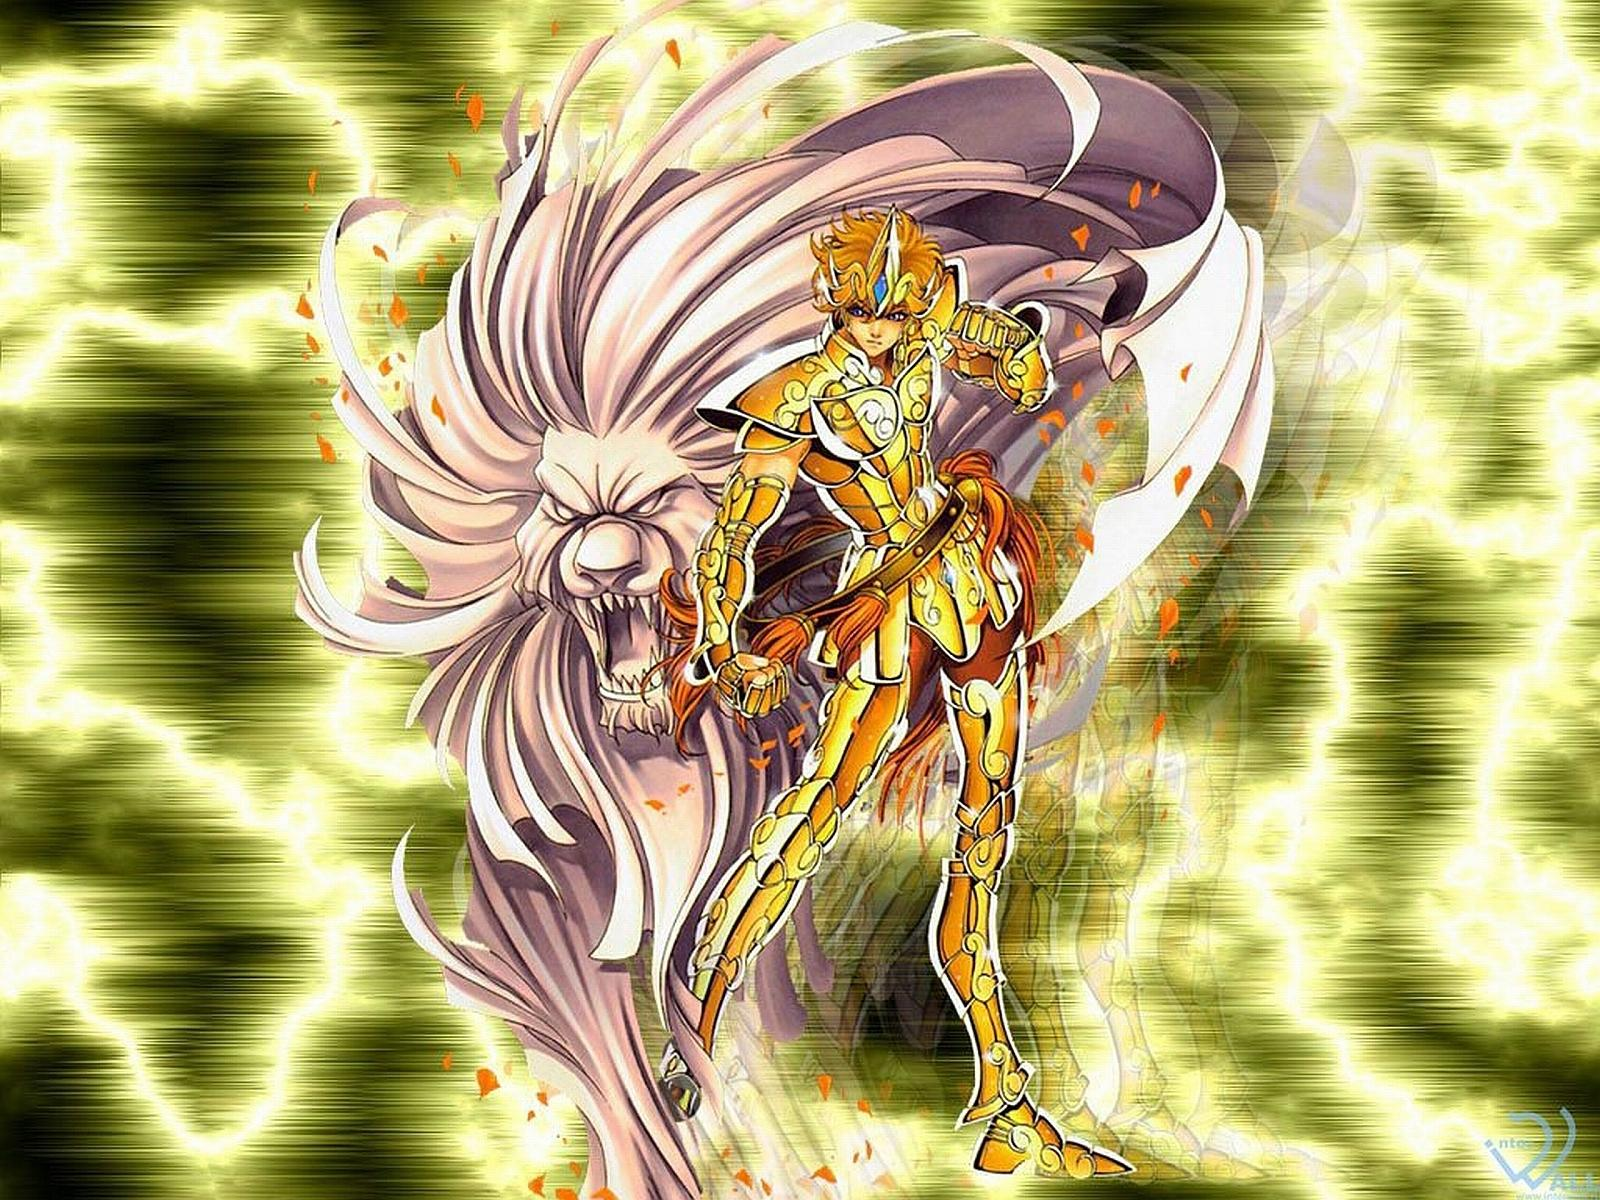 Wallpaper Saint Seiya The Lost Canvas   Meiou Shinwa Anime 1600x1200